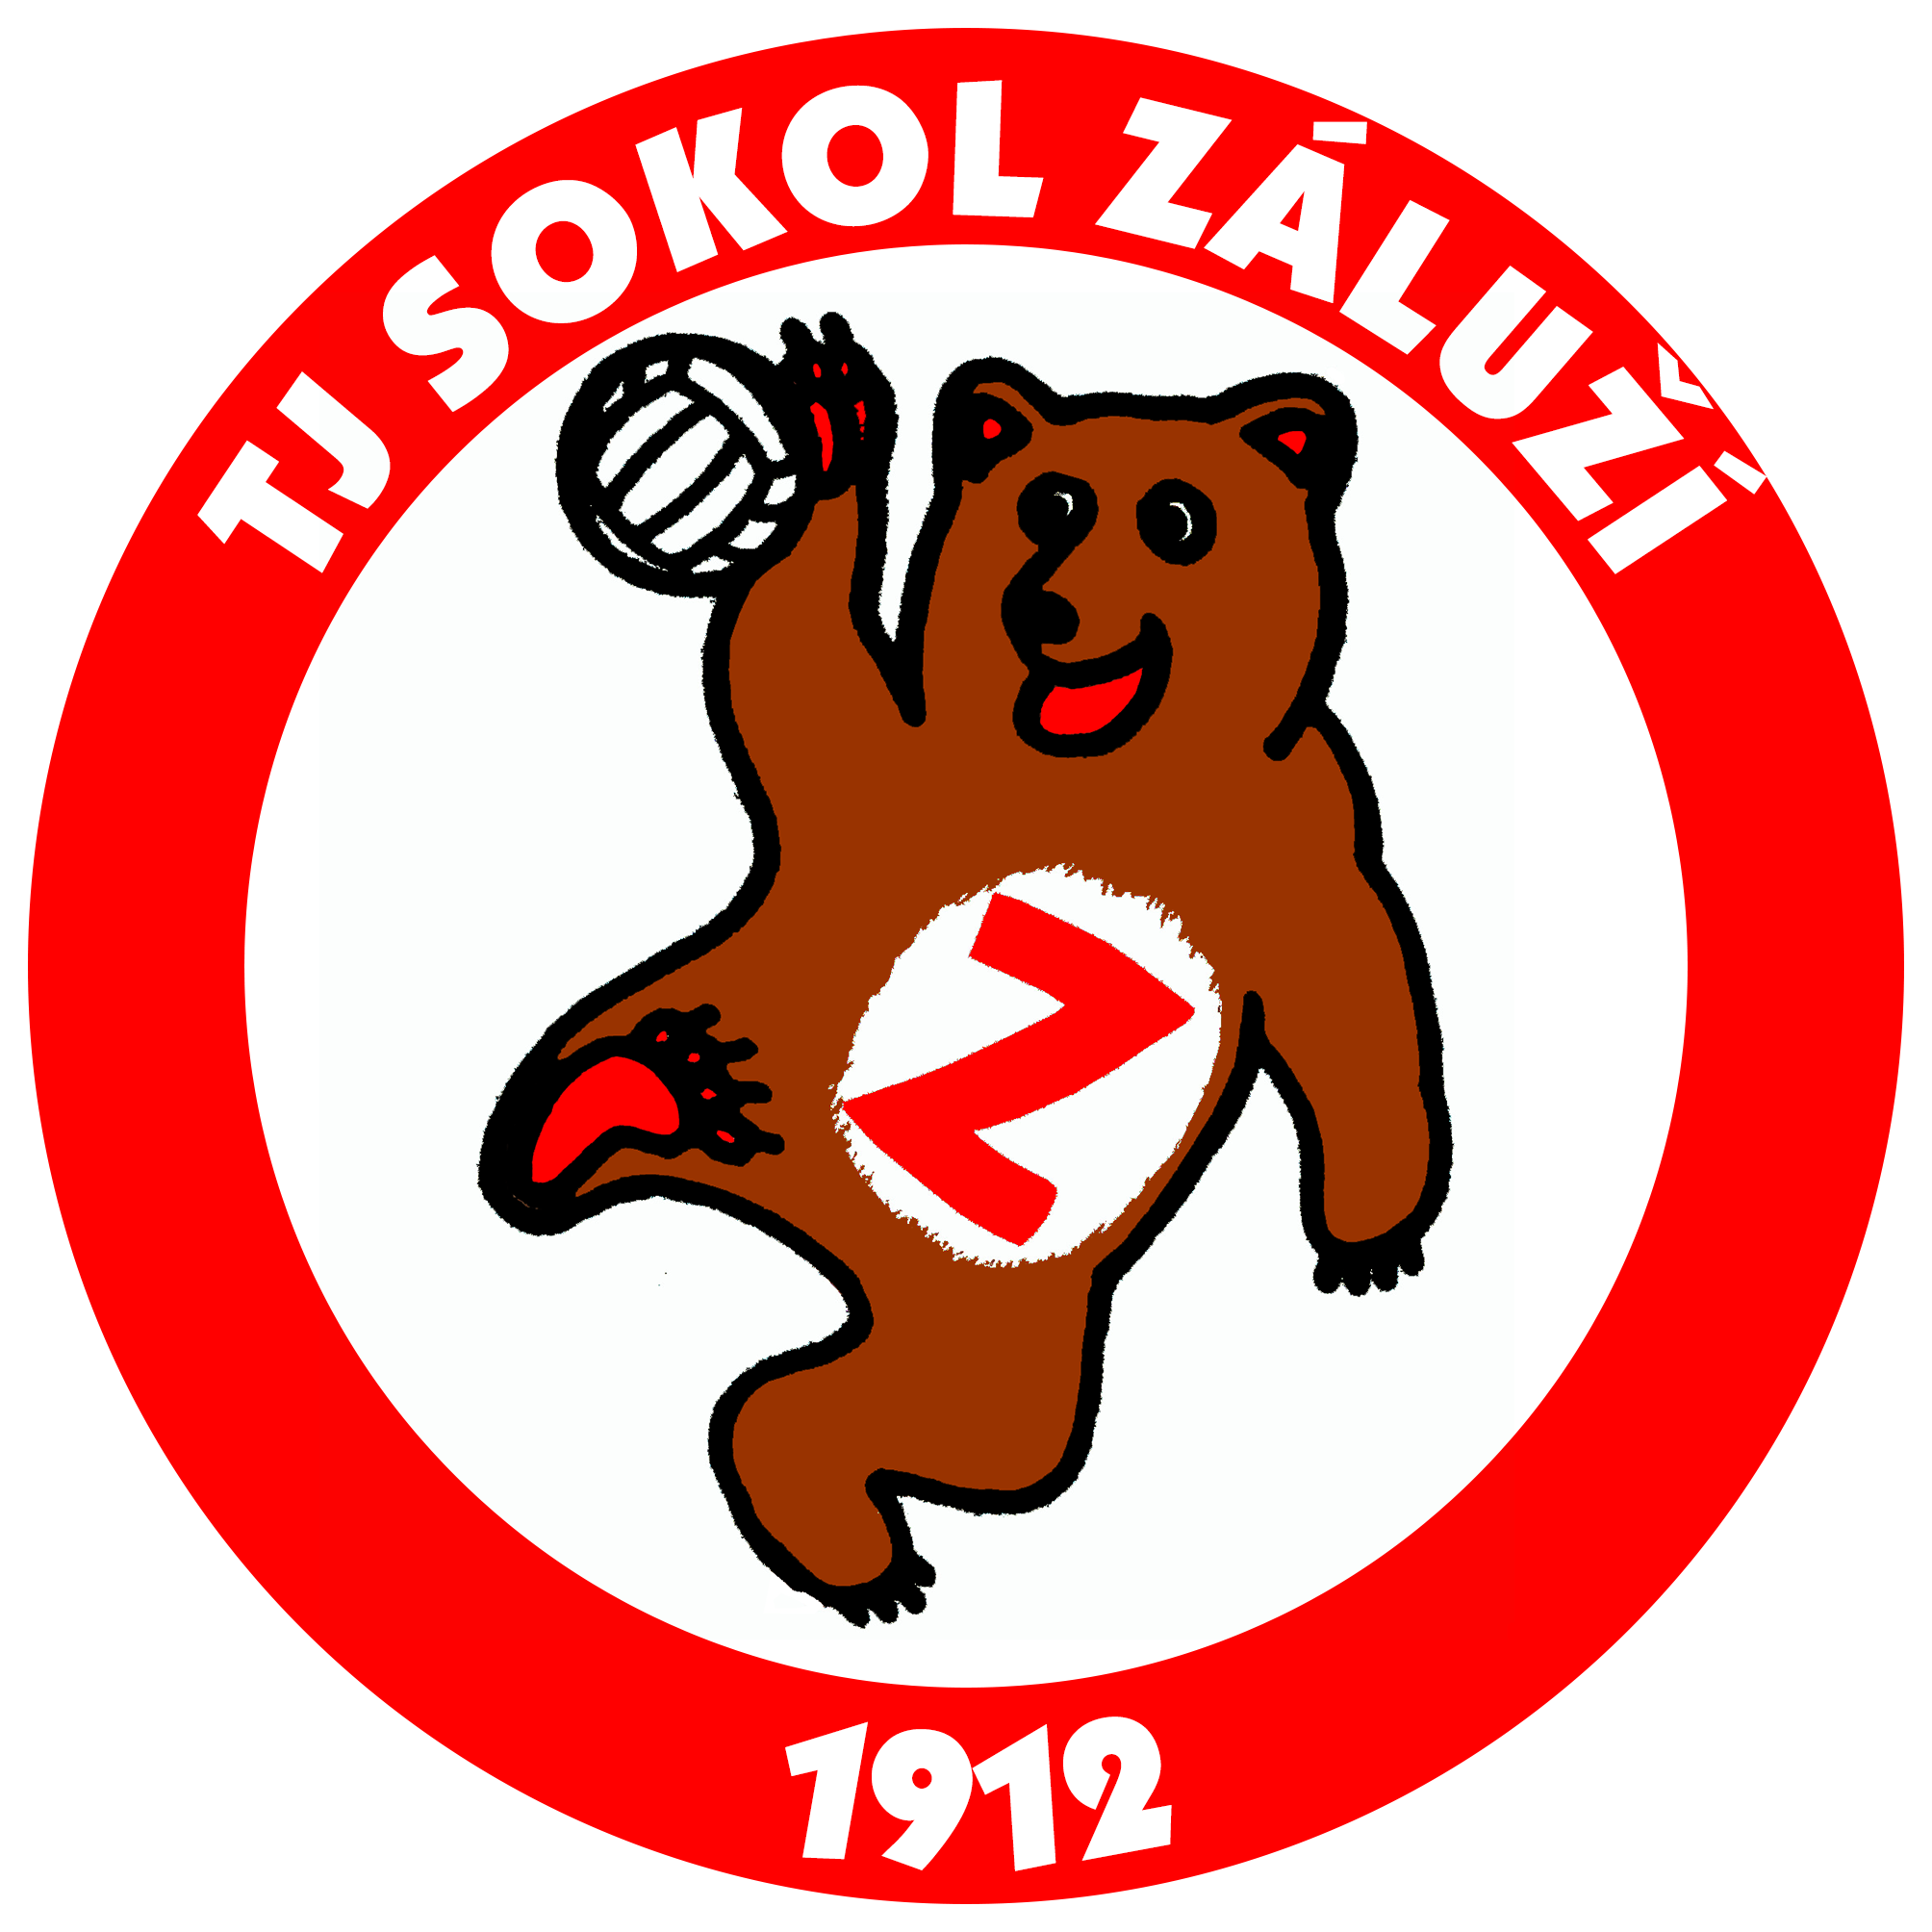 TJ Sokol Záluží